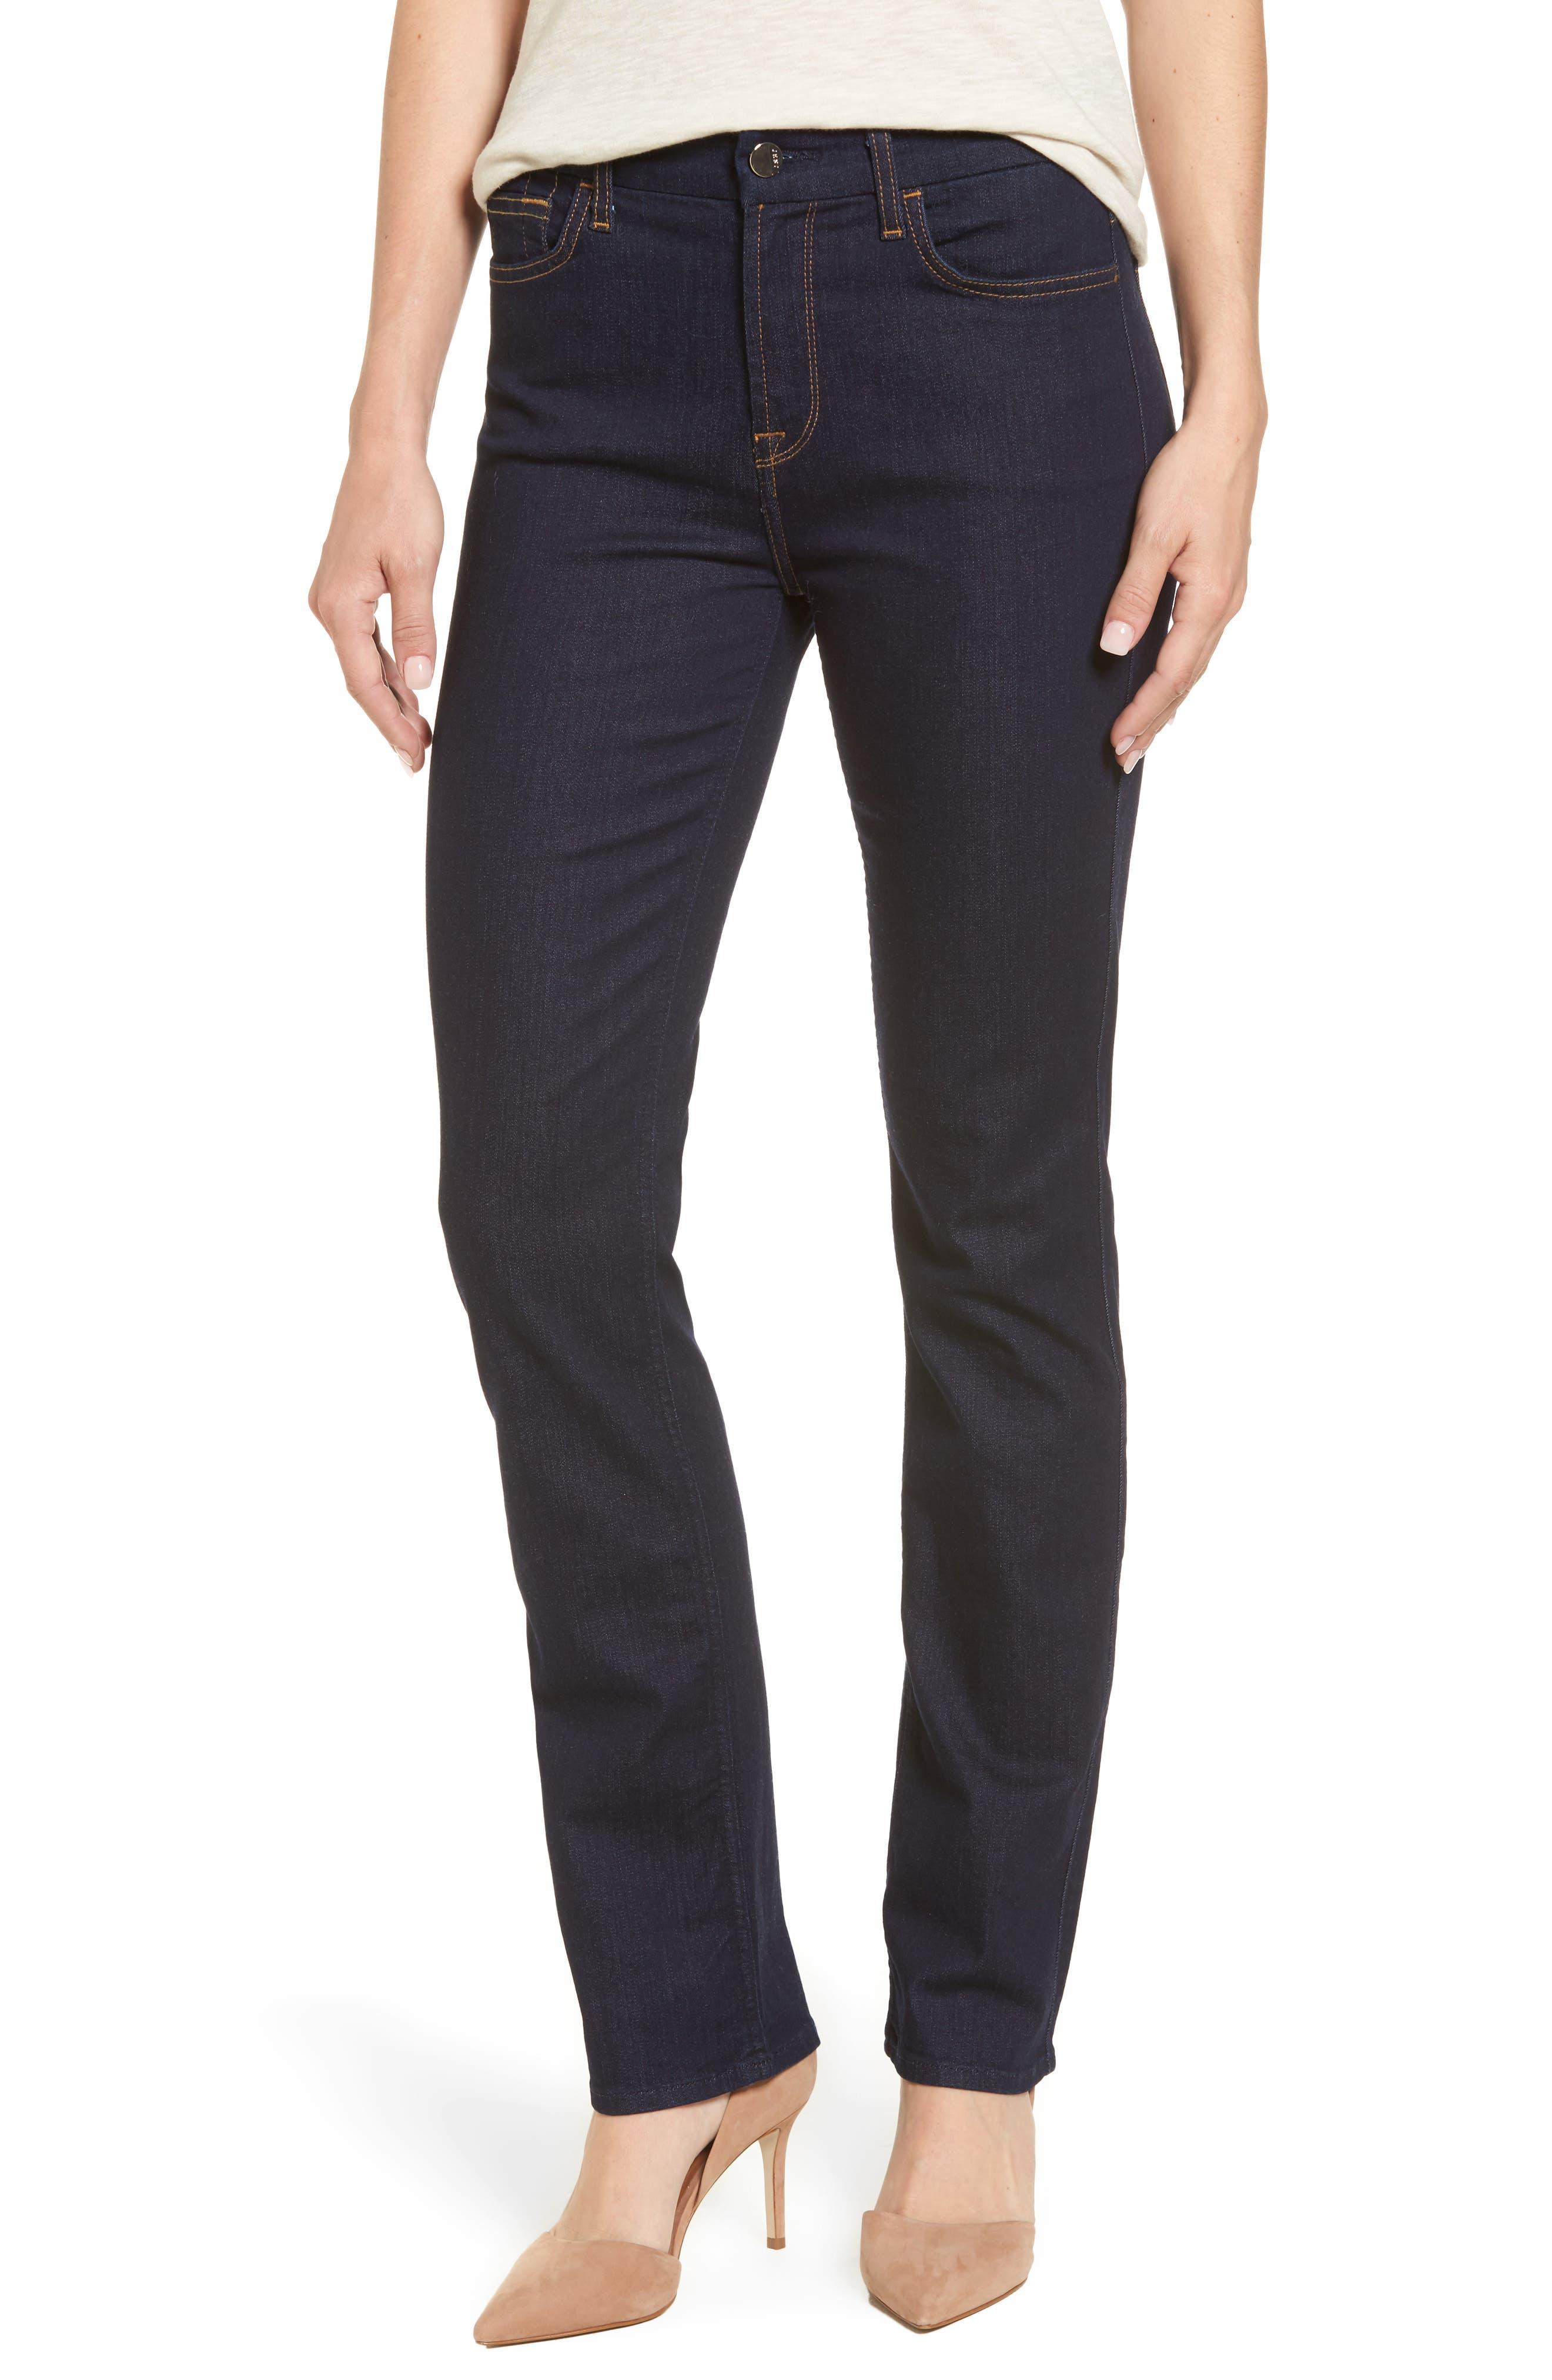 Alternate Image 1 Selected - Jen7 Stretch Slim Straight Leg Jeans (Riche Touch Estancia Blue)